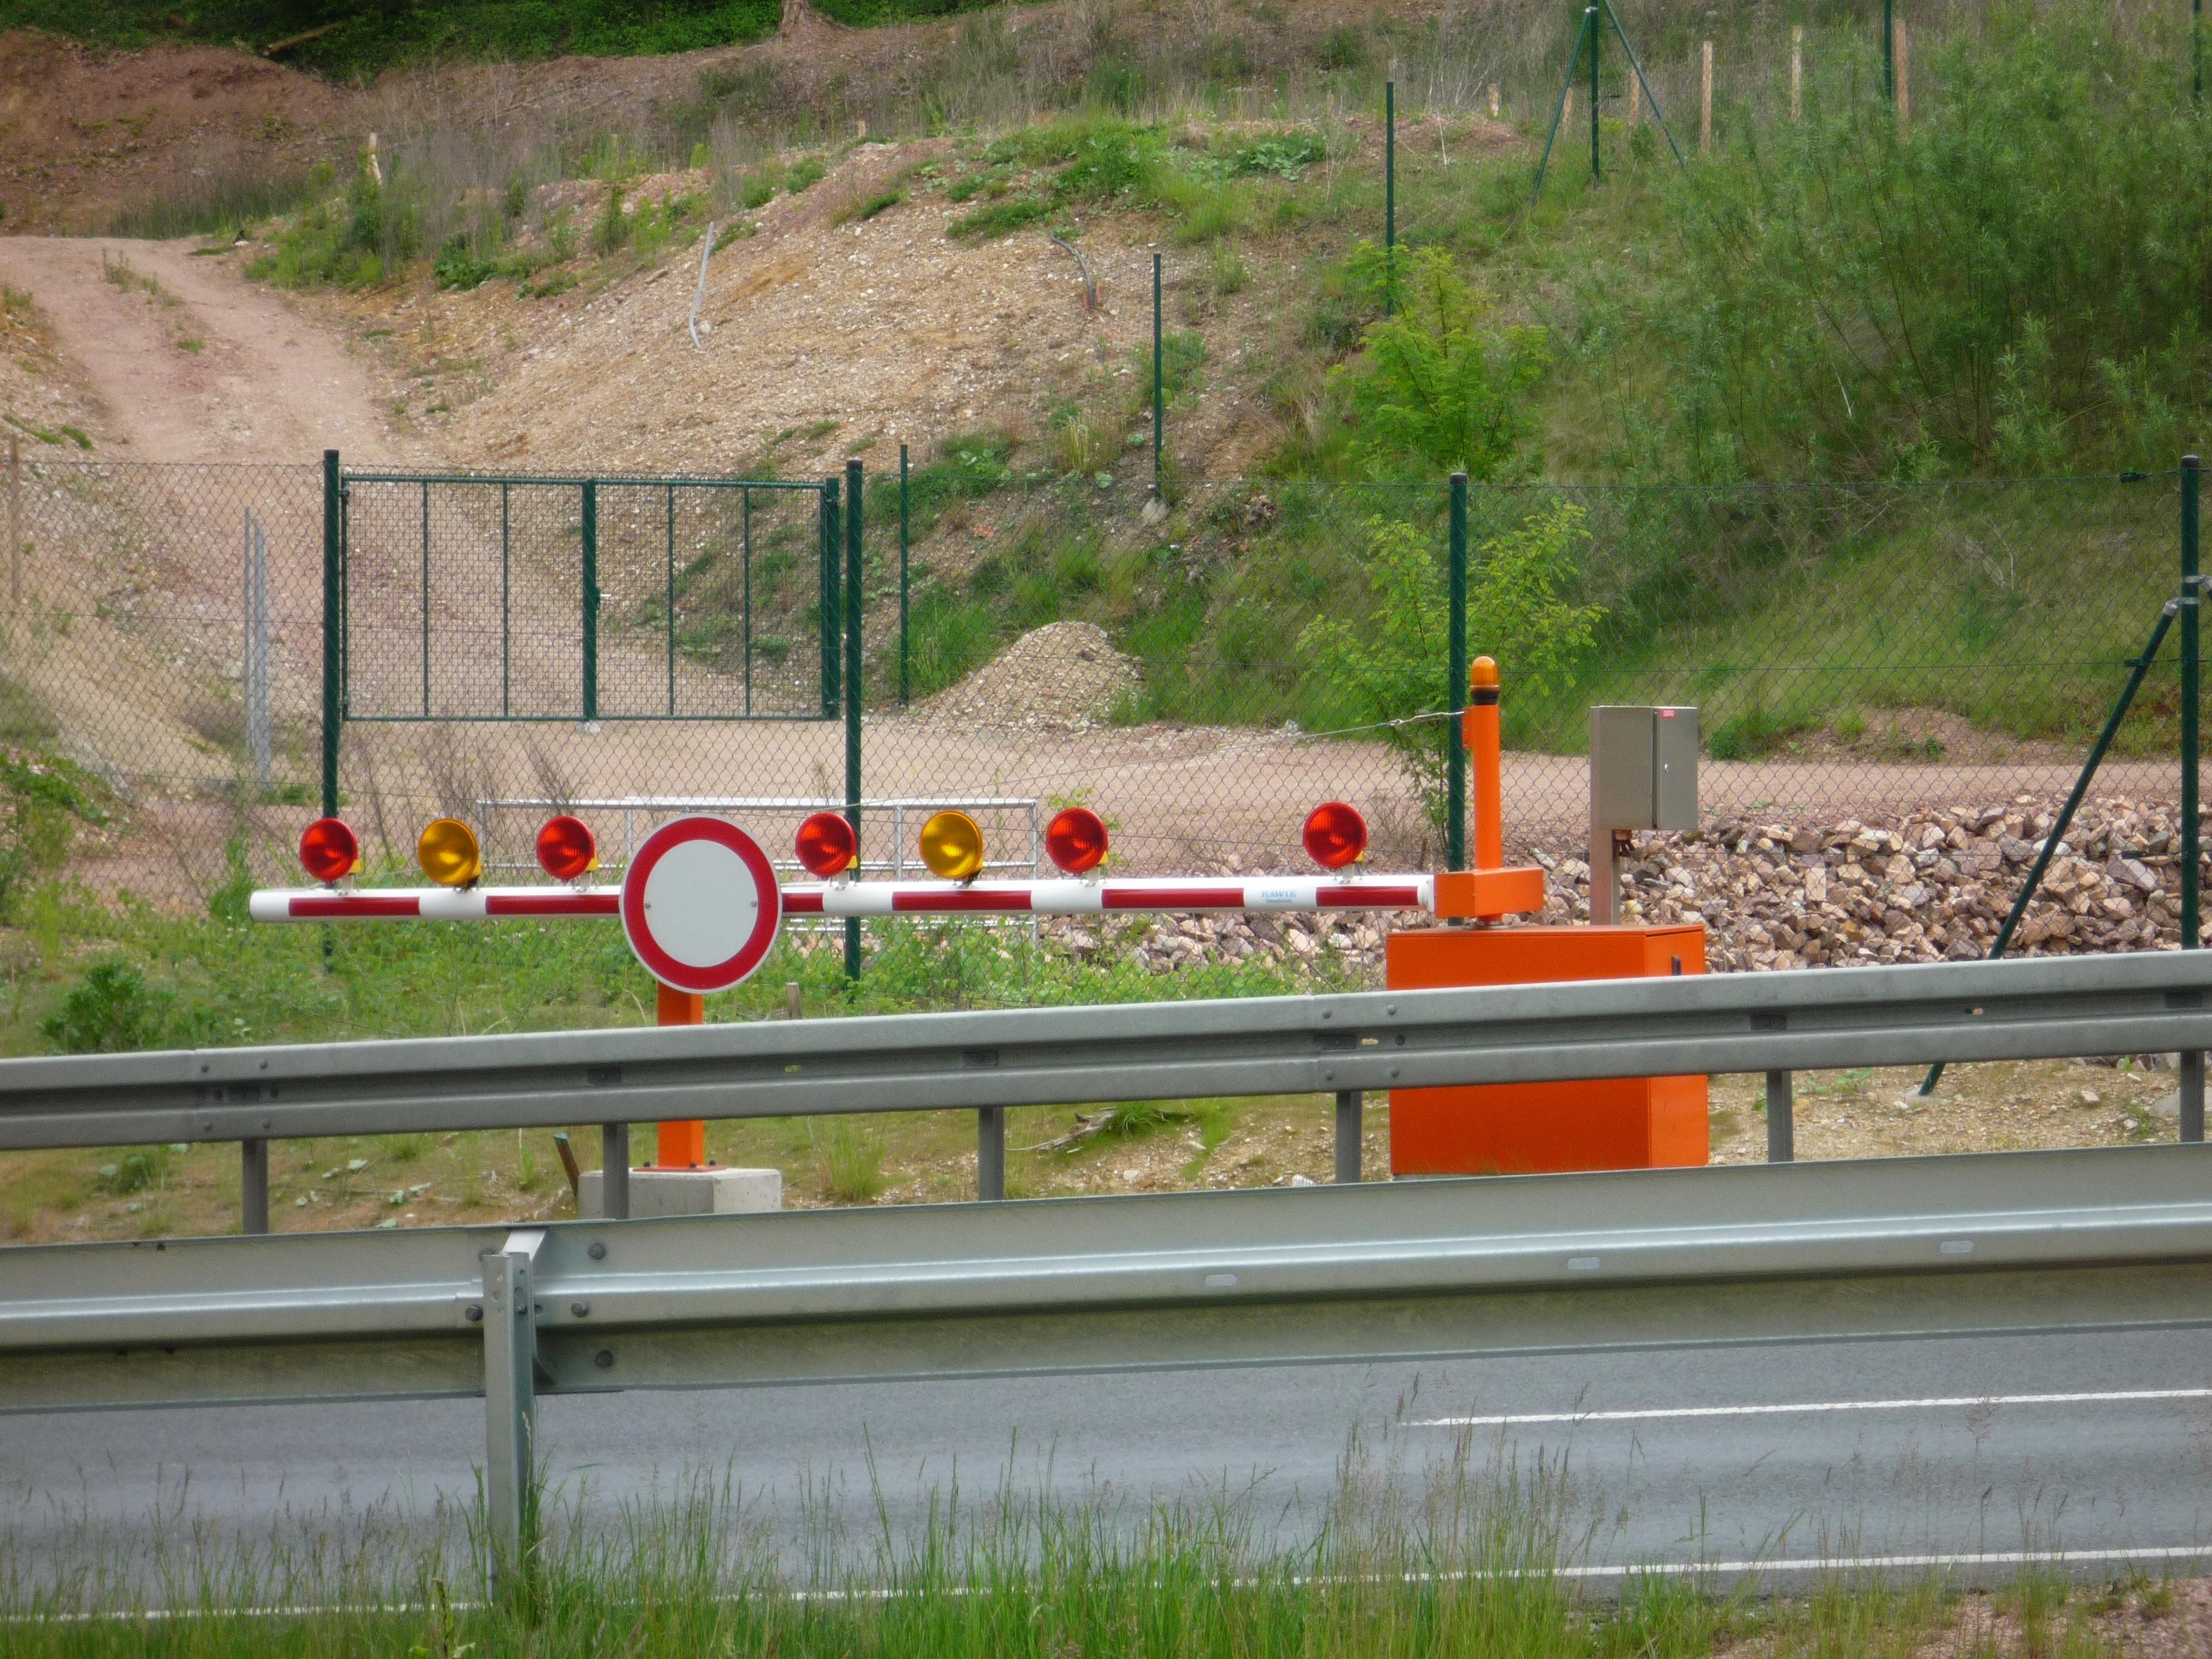 File Schottenbergtunnel Schrankenanlage Jpg Wikimedia Commons